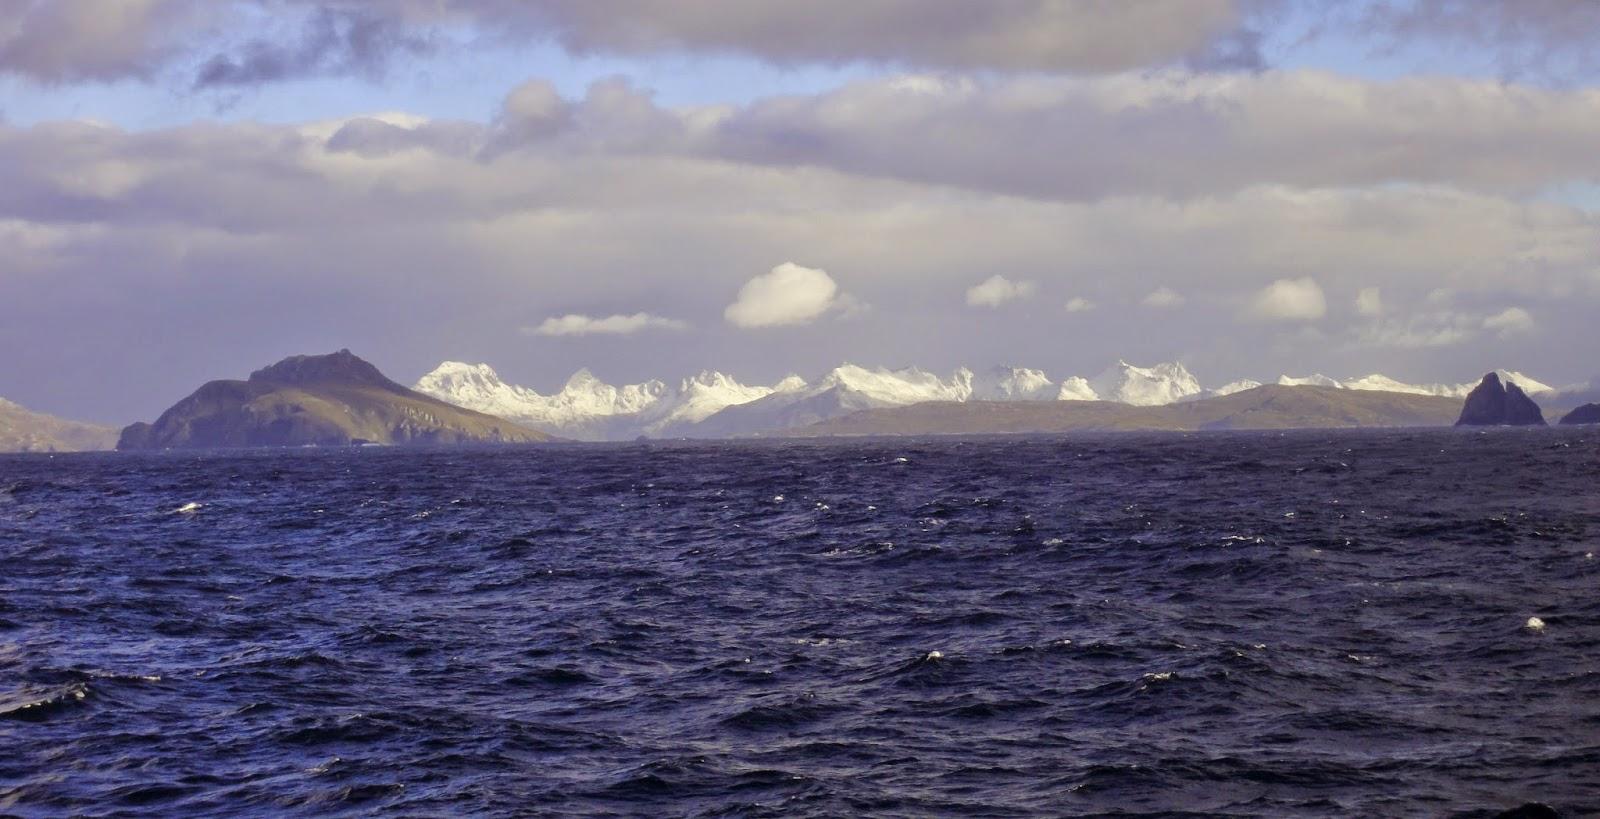 chile pacific and atlantic ocean meet